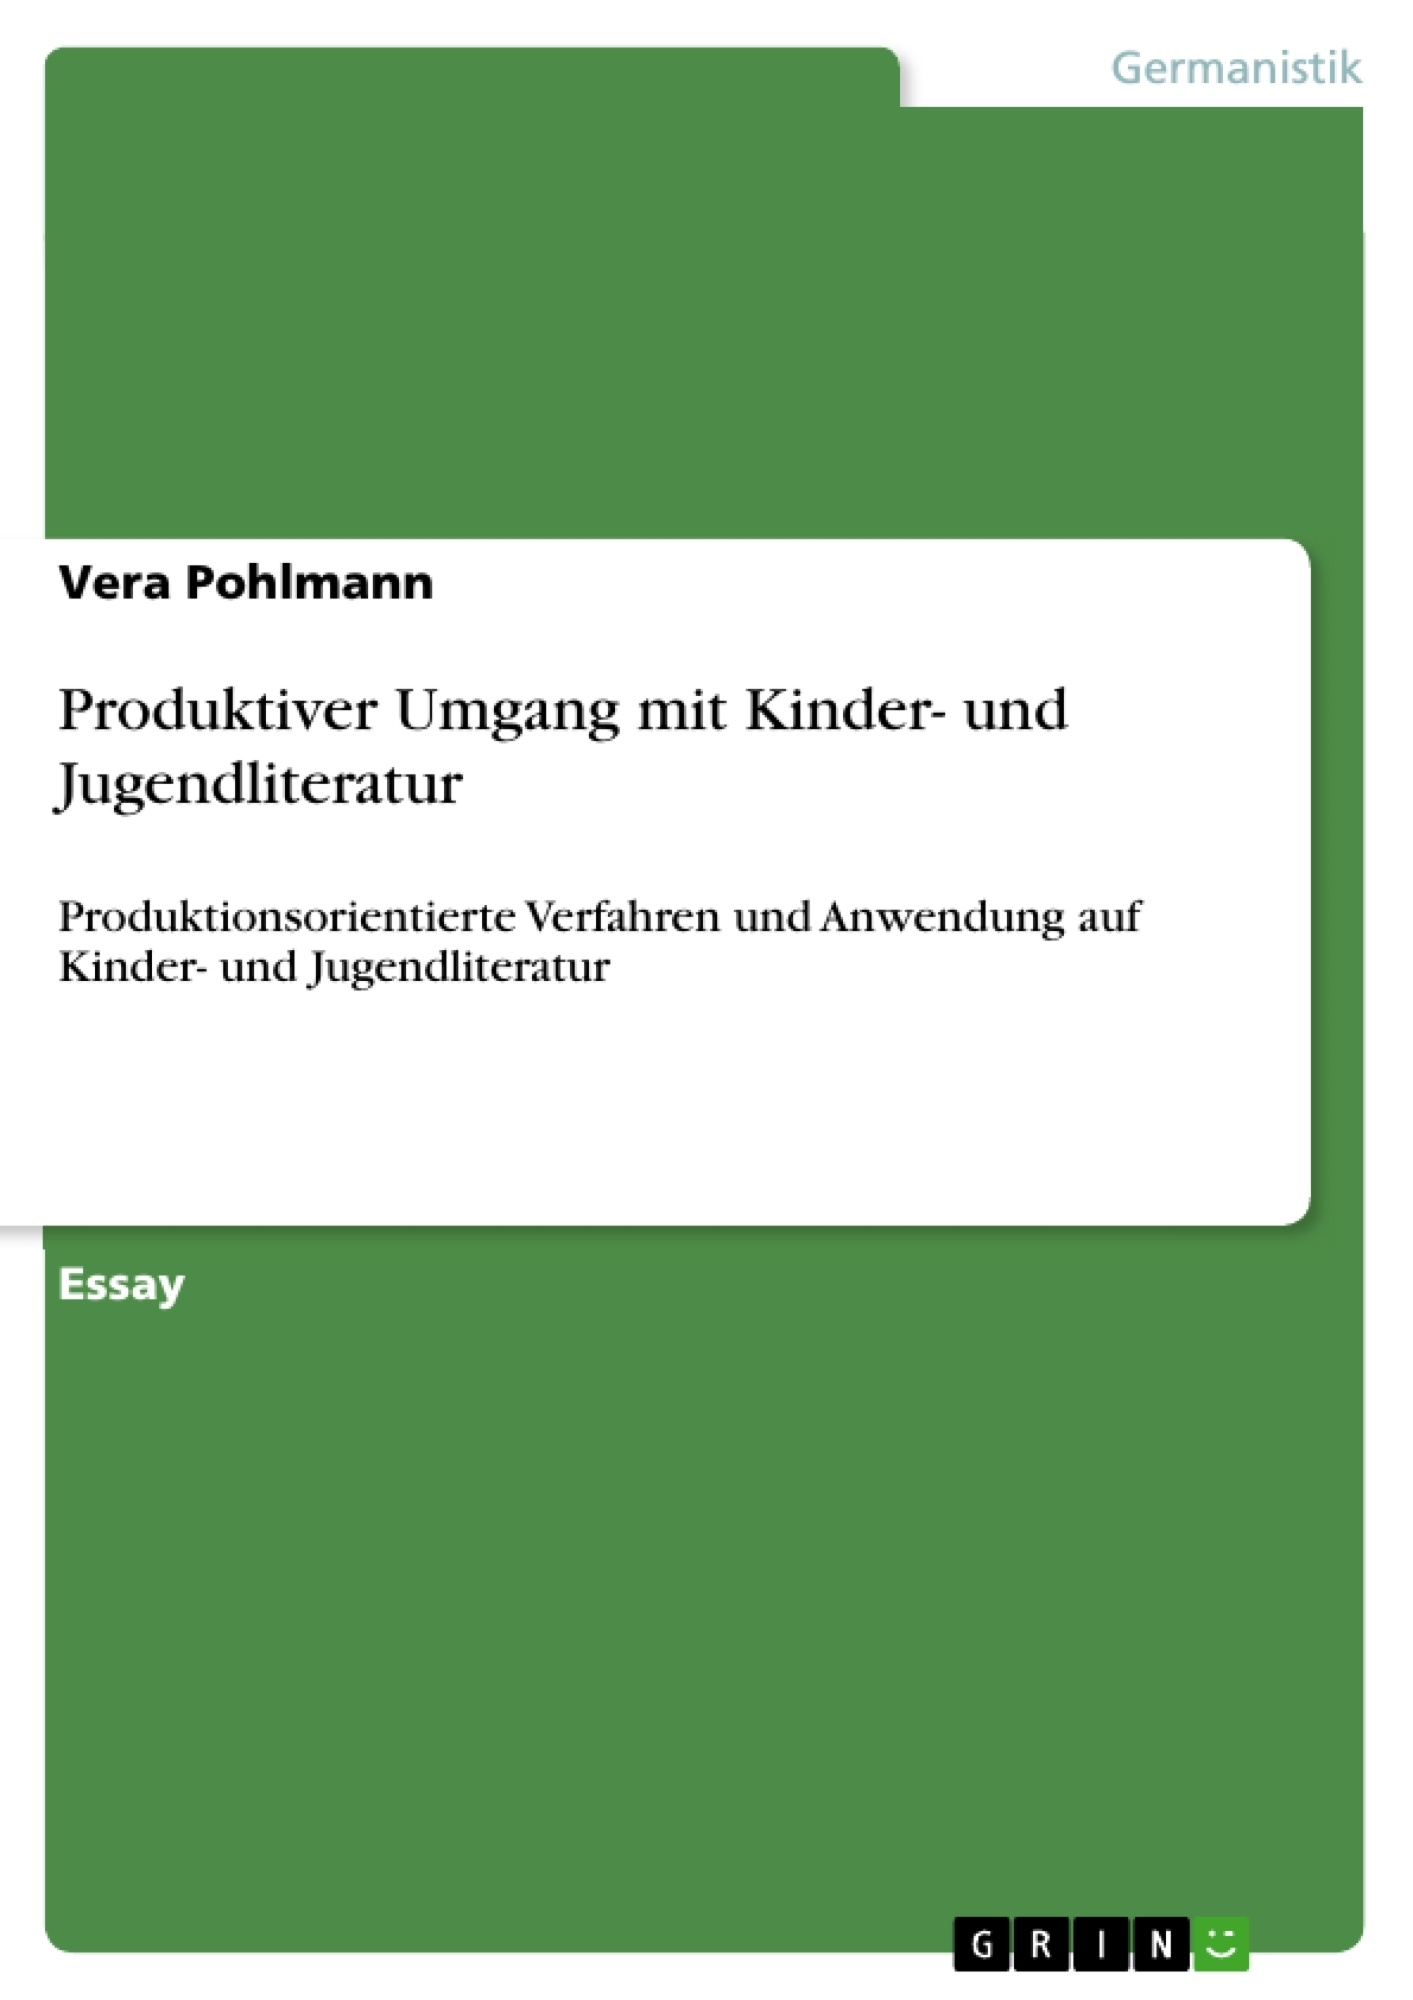 Titel: Produktiver Umgang mit Kinder- und Jugendliteratur